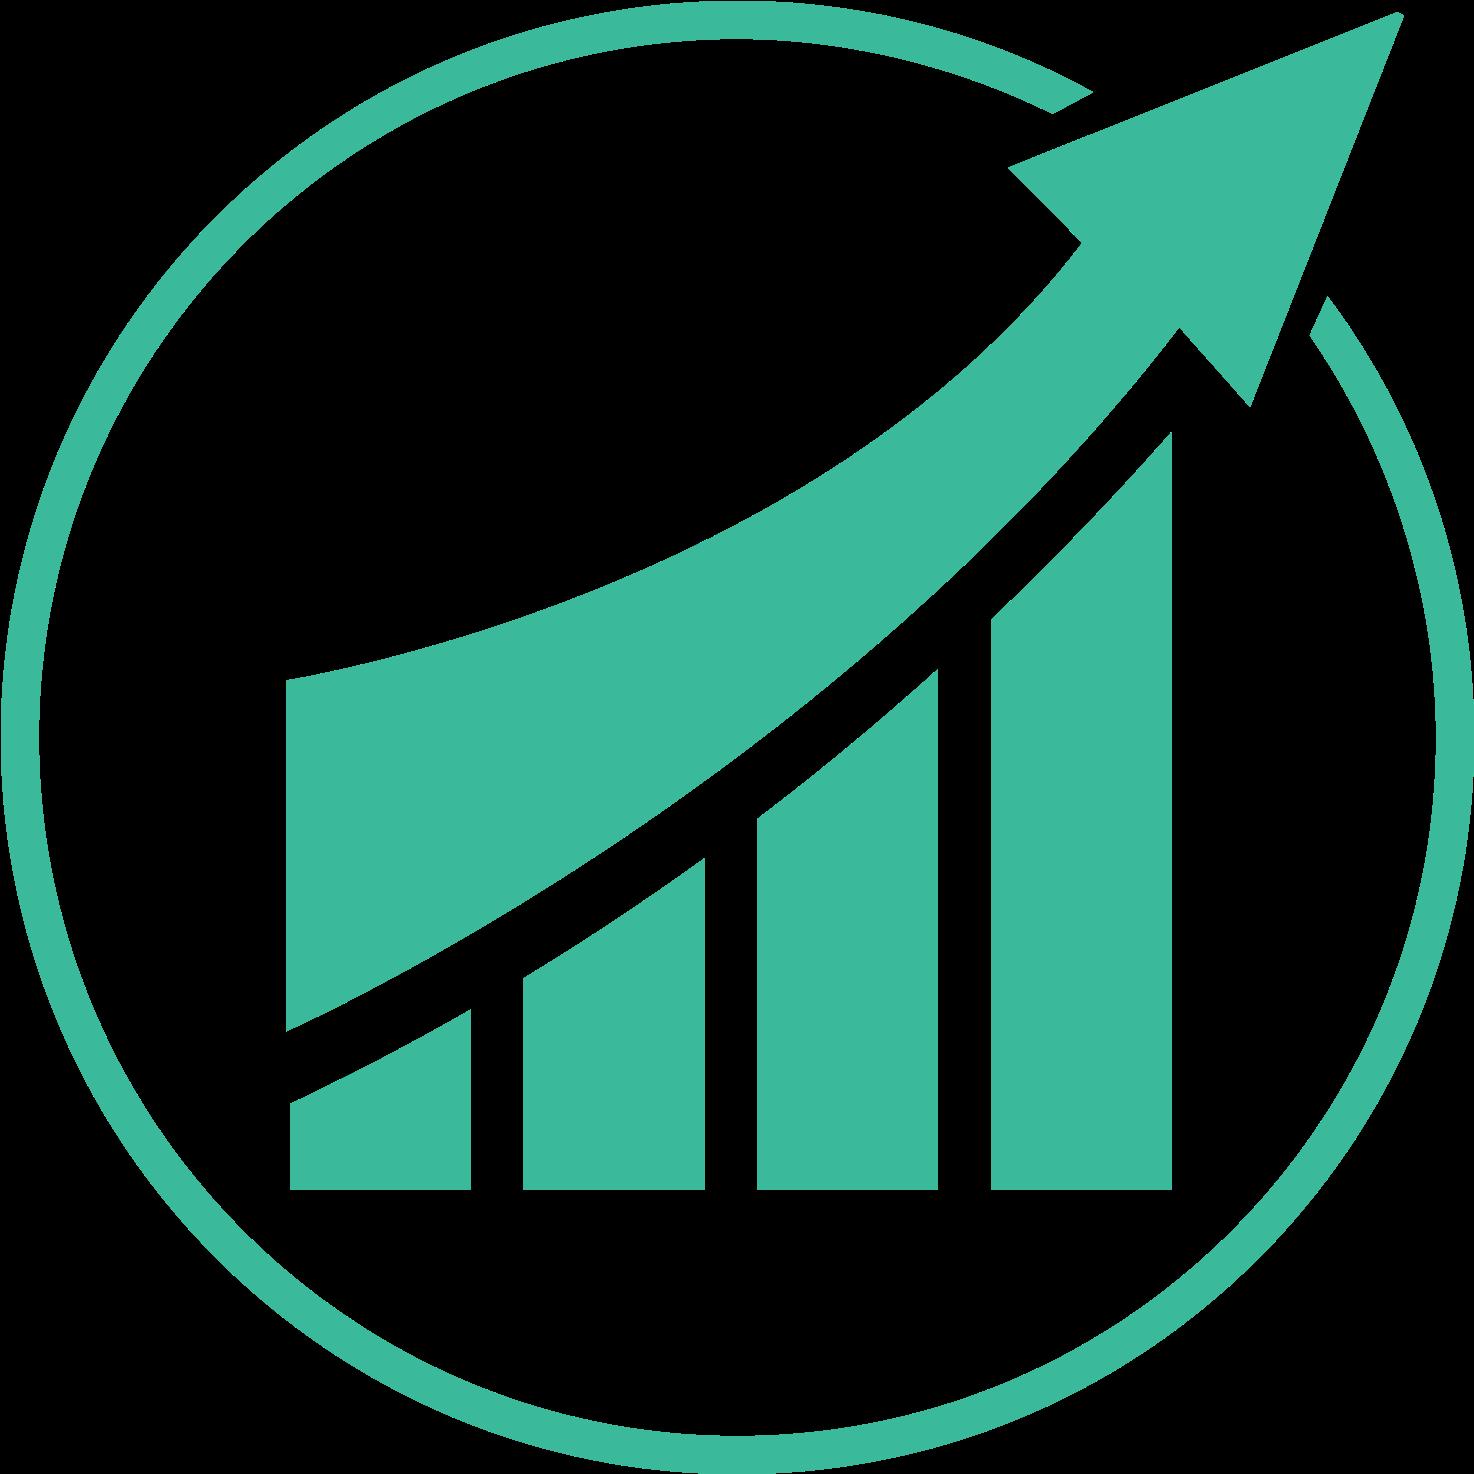 Логотип развития картинки